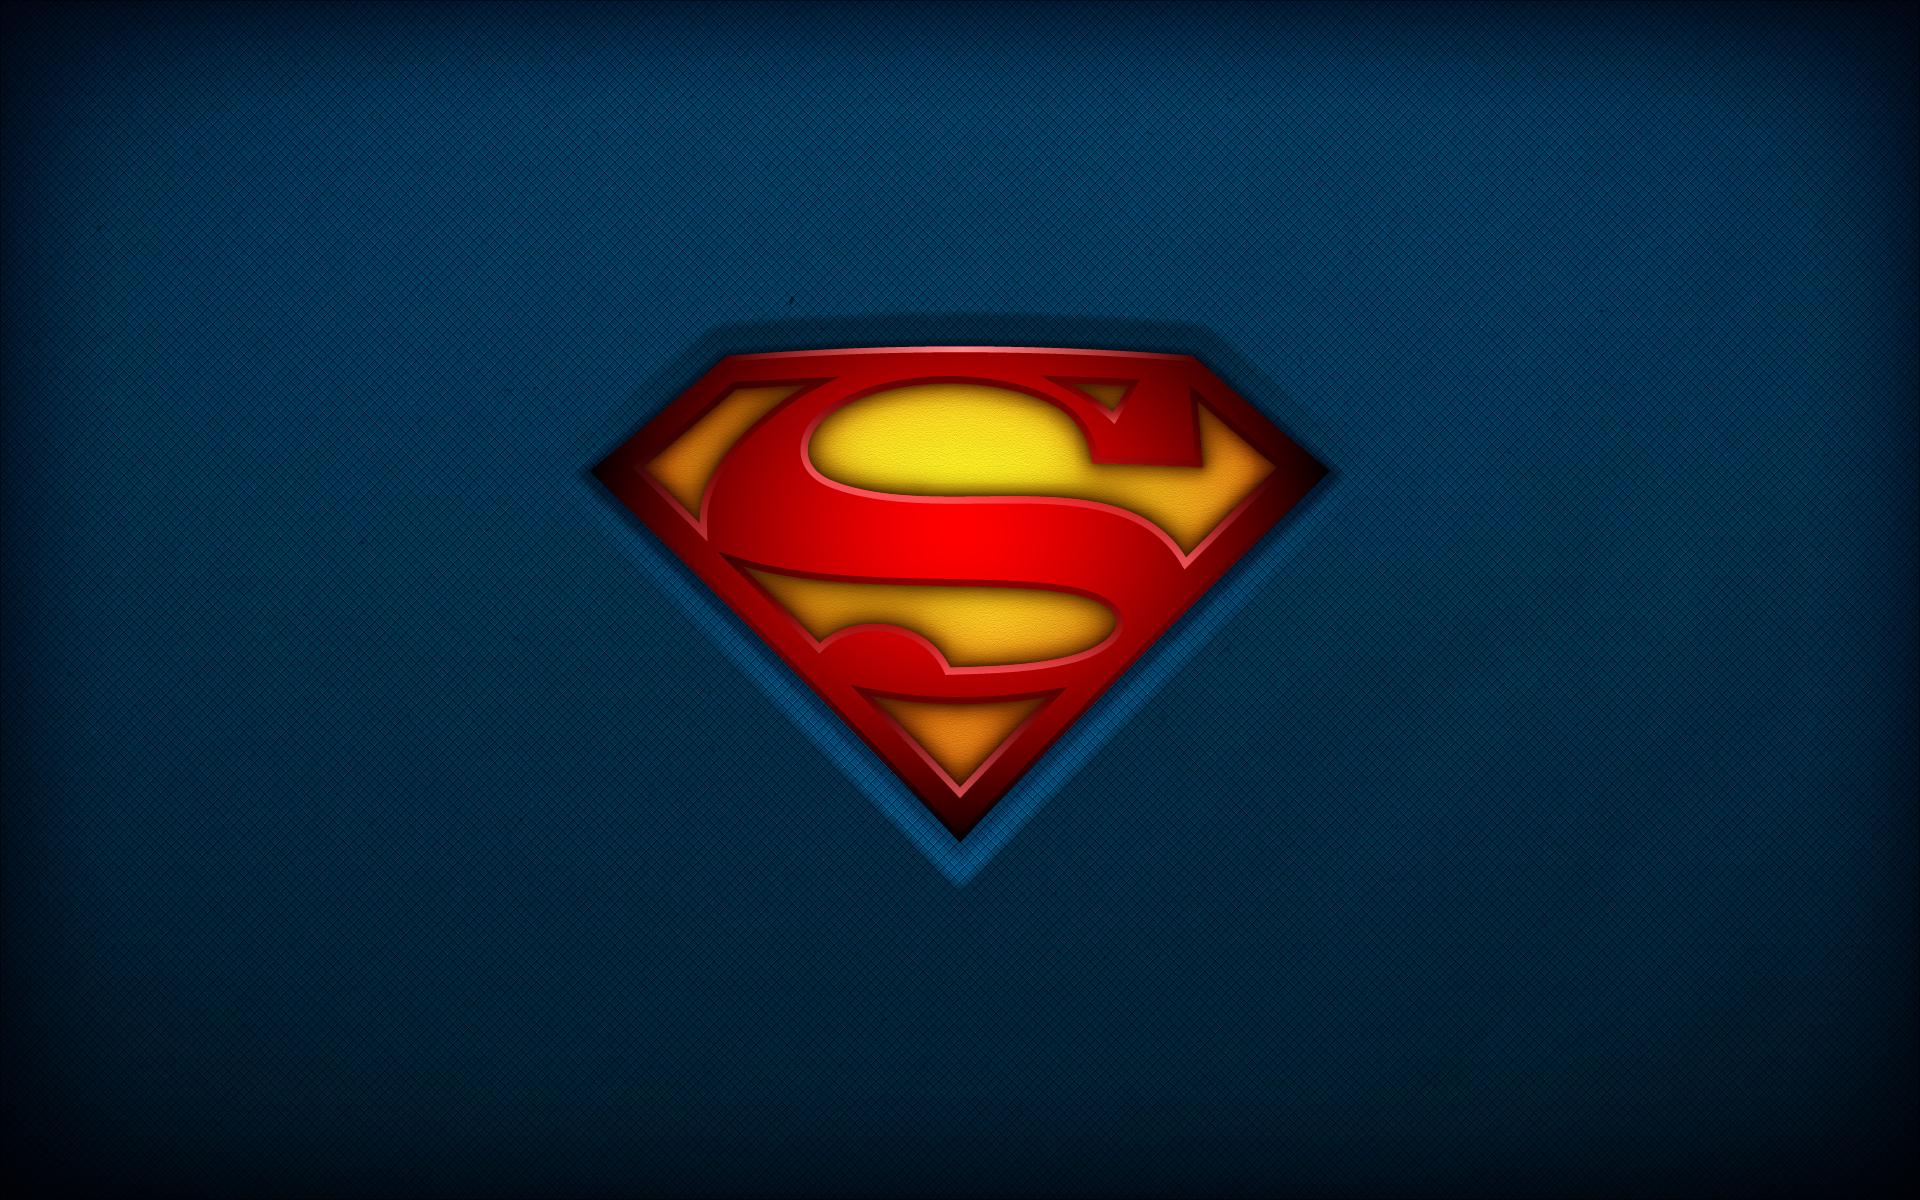 Superman Logo HD Wallpapers 1920x1200